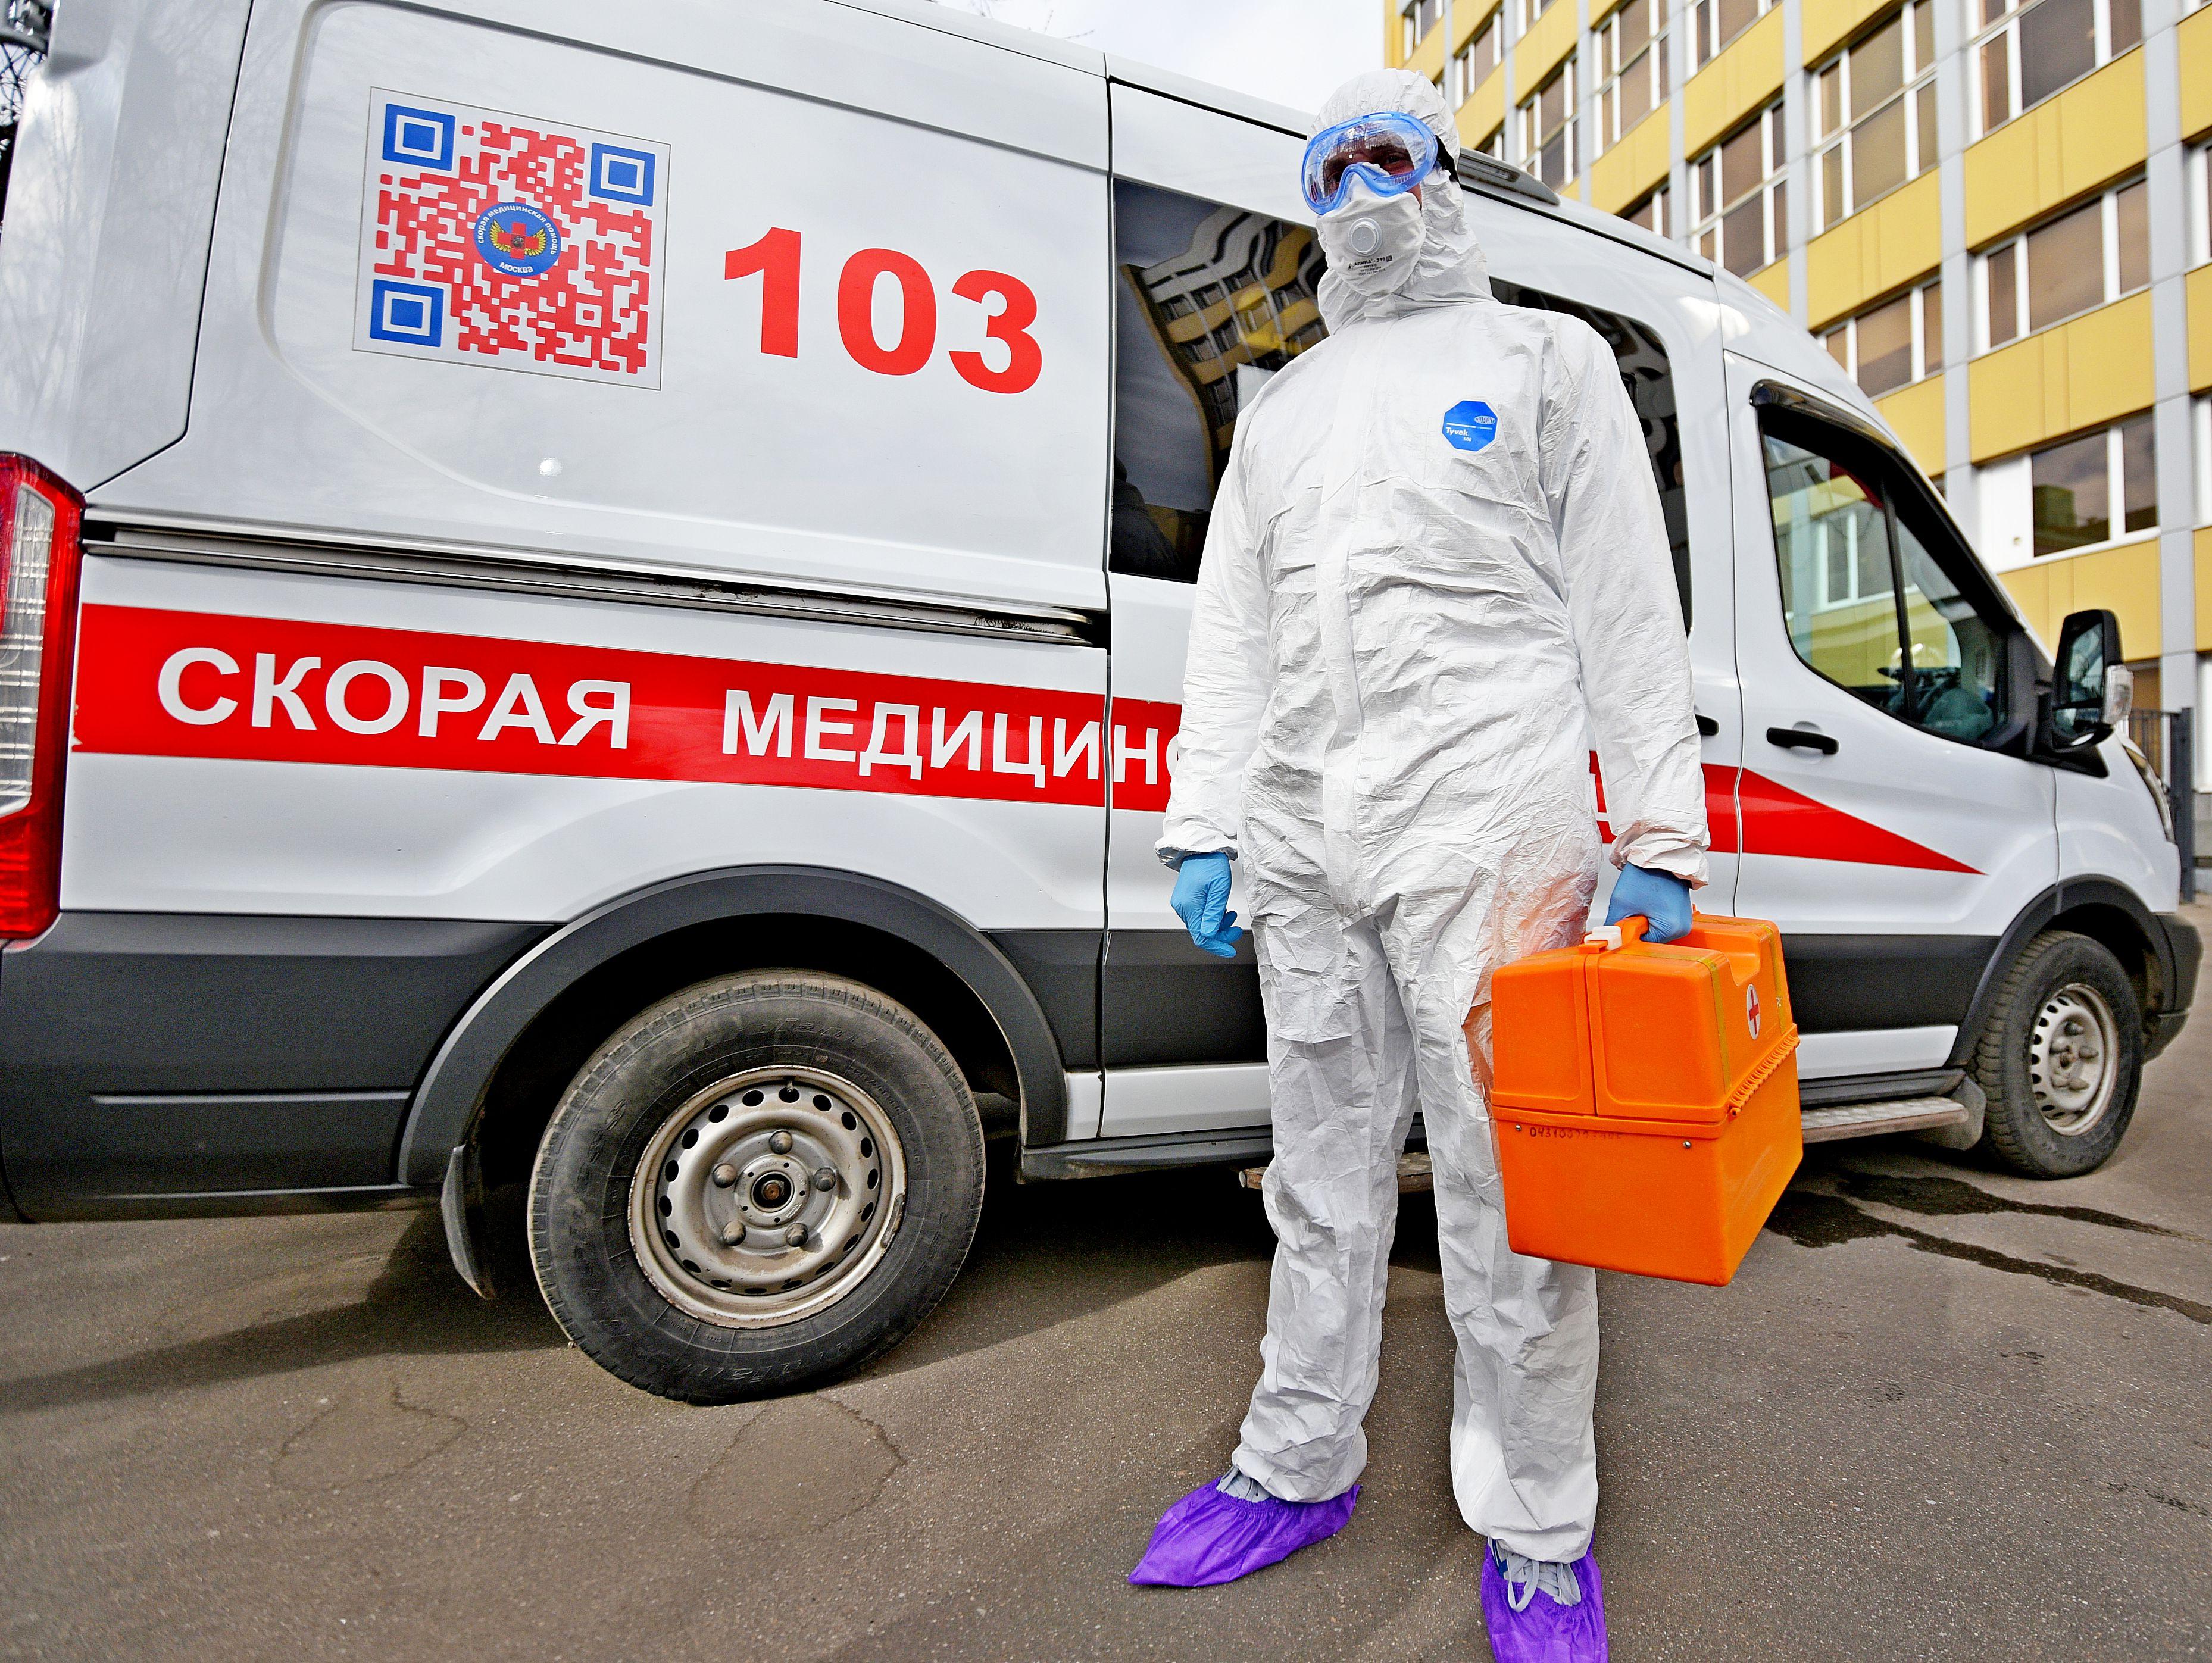 Более 1,9 тысячи человек подхватили коронавирус в Москве за сутки